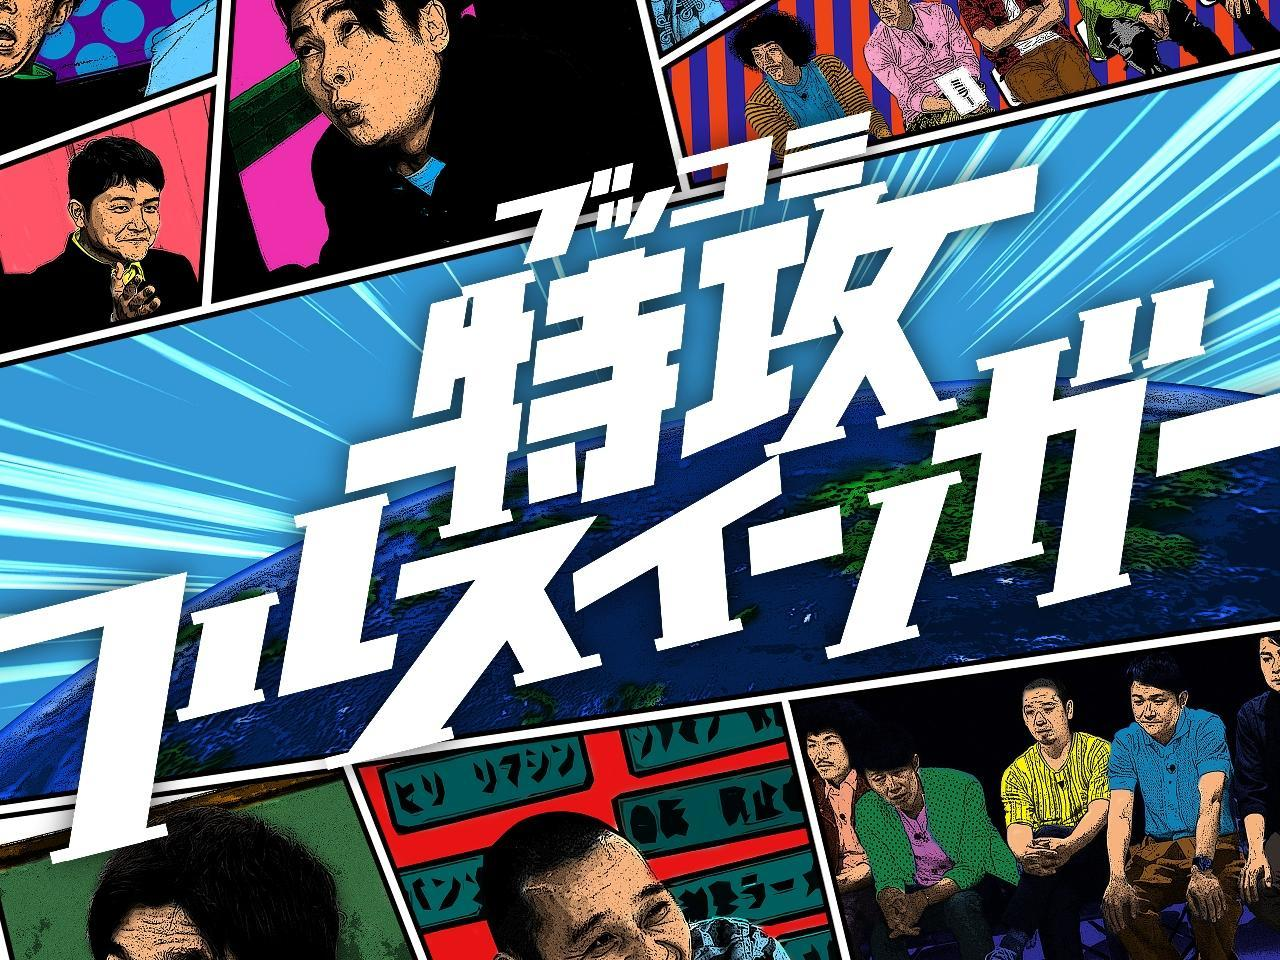 http://news.yoshimoto.co.jp/20170810222144-6df396b4b69b625dc76fb032ac7617cf020b2dff.jpg